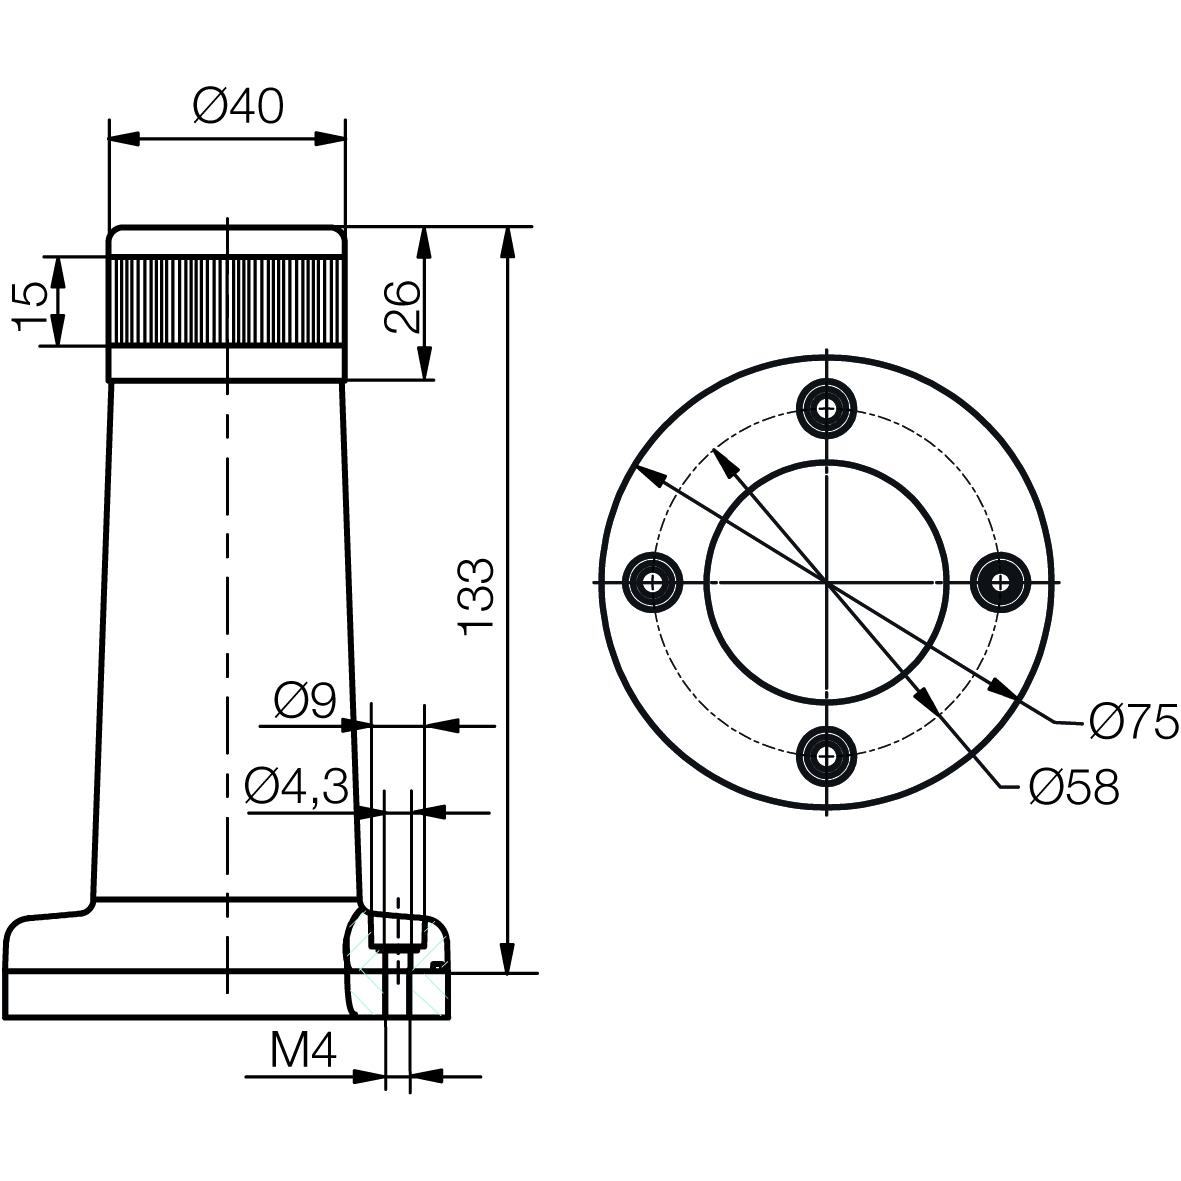 LED-Kompakt-Towerlampe mit Montagefuß RYG - plan